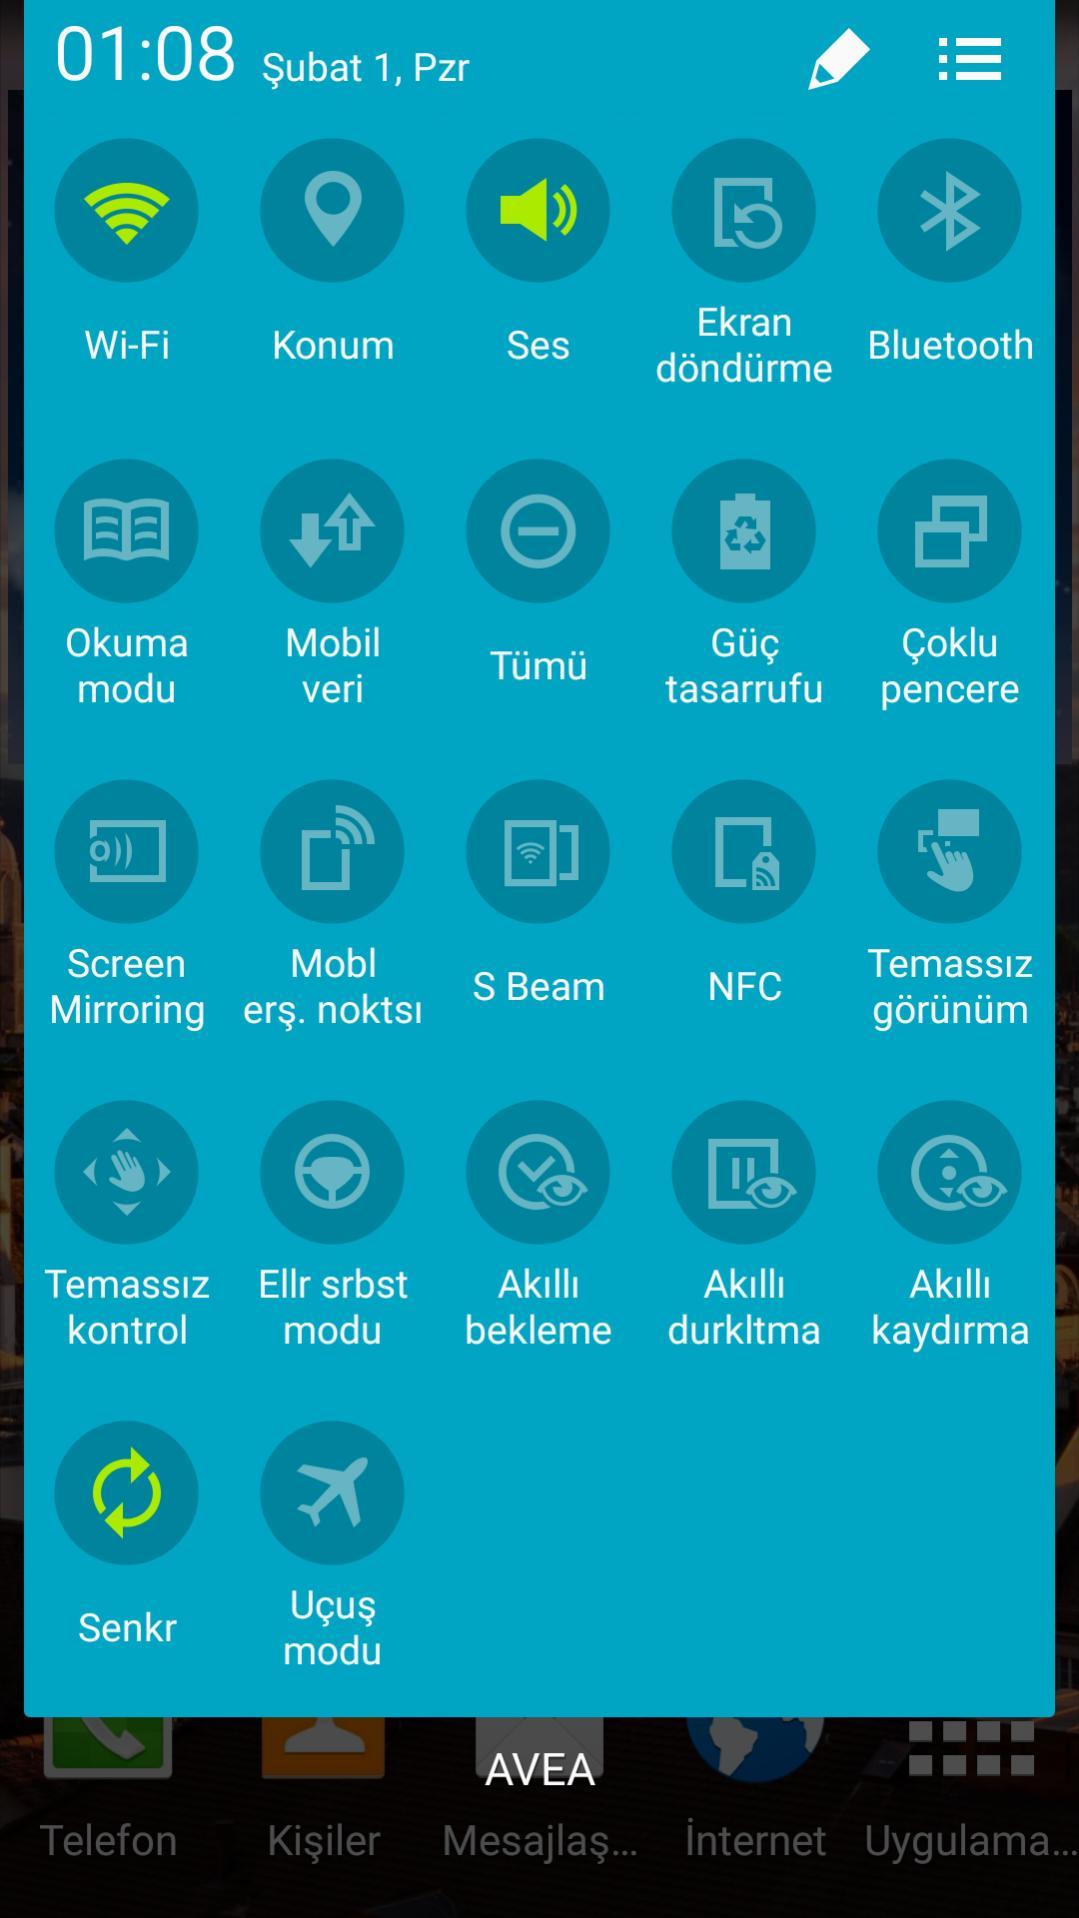 Click image for larger version  Name:Screenshot_2015-02-01-01-08-13.jpg Views:28640 Size:139.1 KB ID:3150166